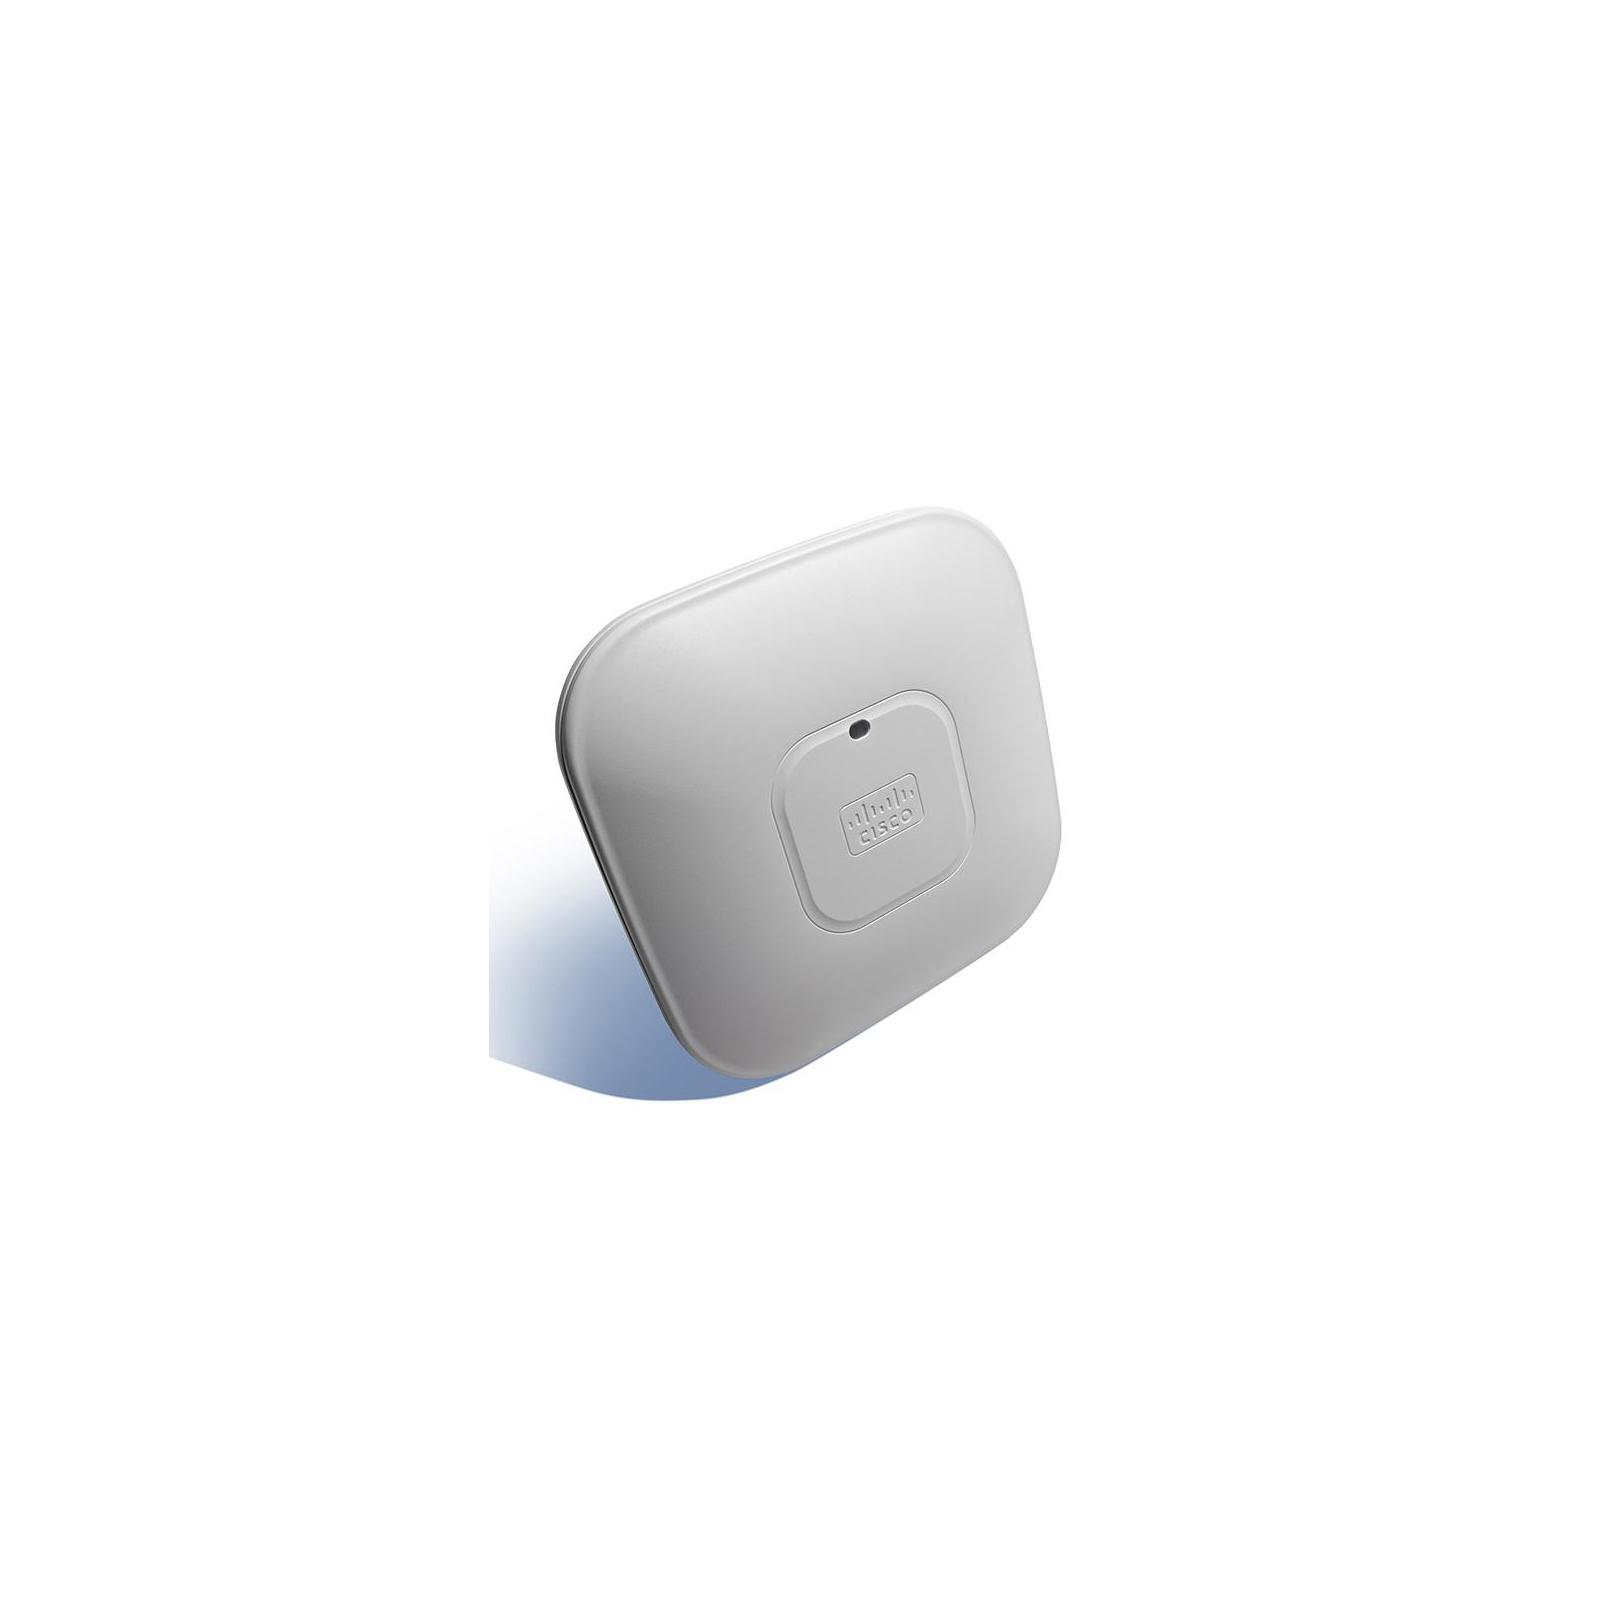 Точка доступа Wi-Fi Cisco AIR-SAP2602I-E (AIR-SAP2602I-E-K9) изображение 2